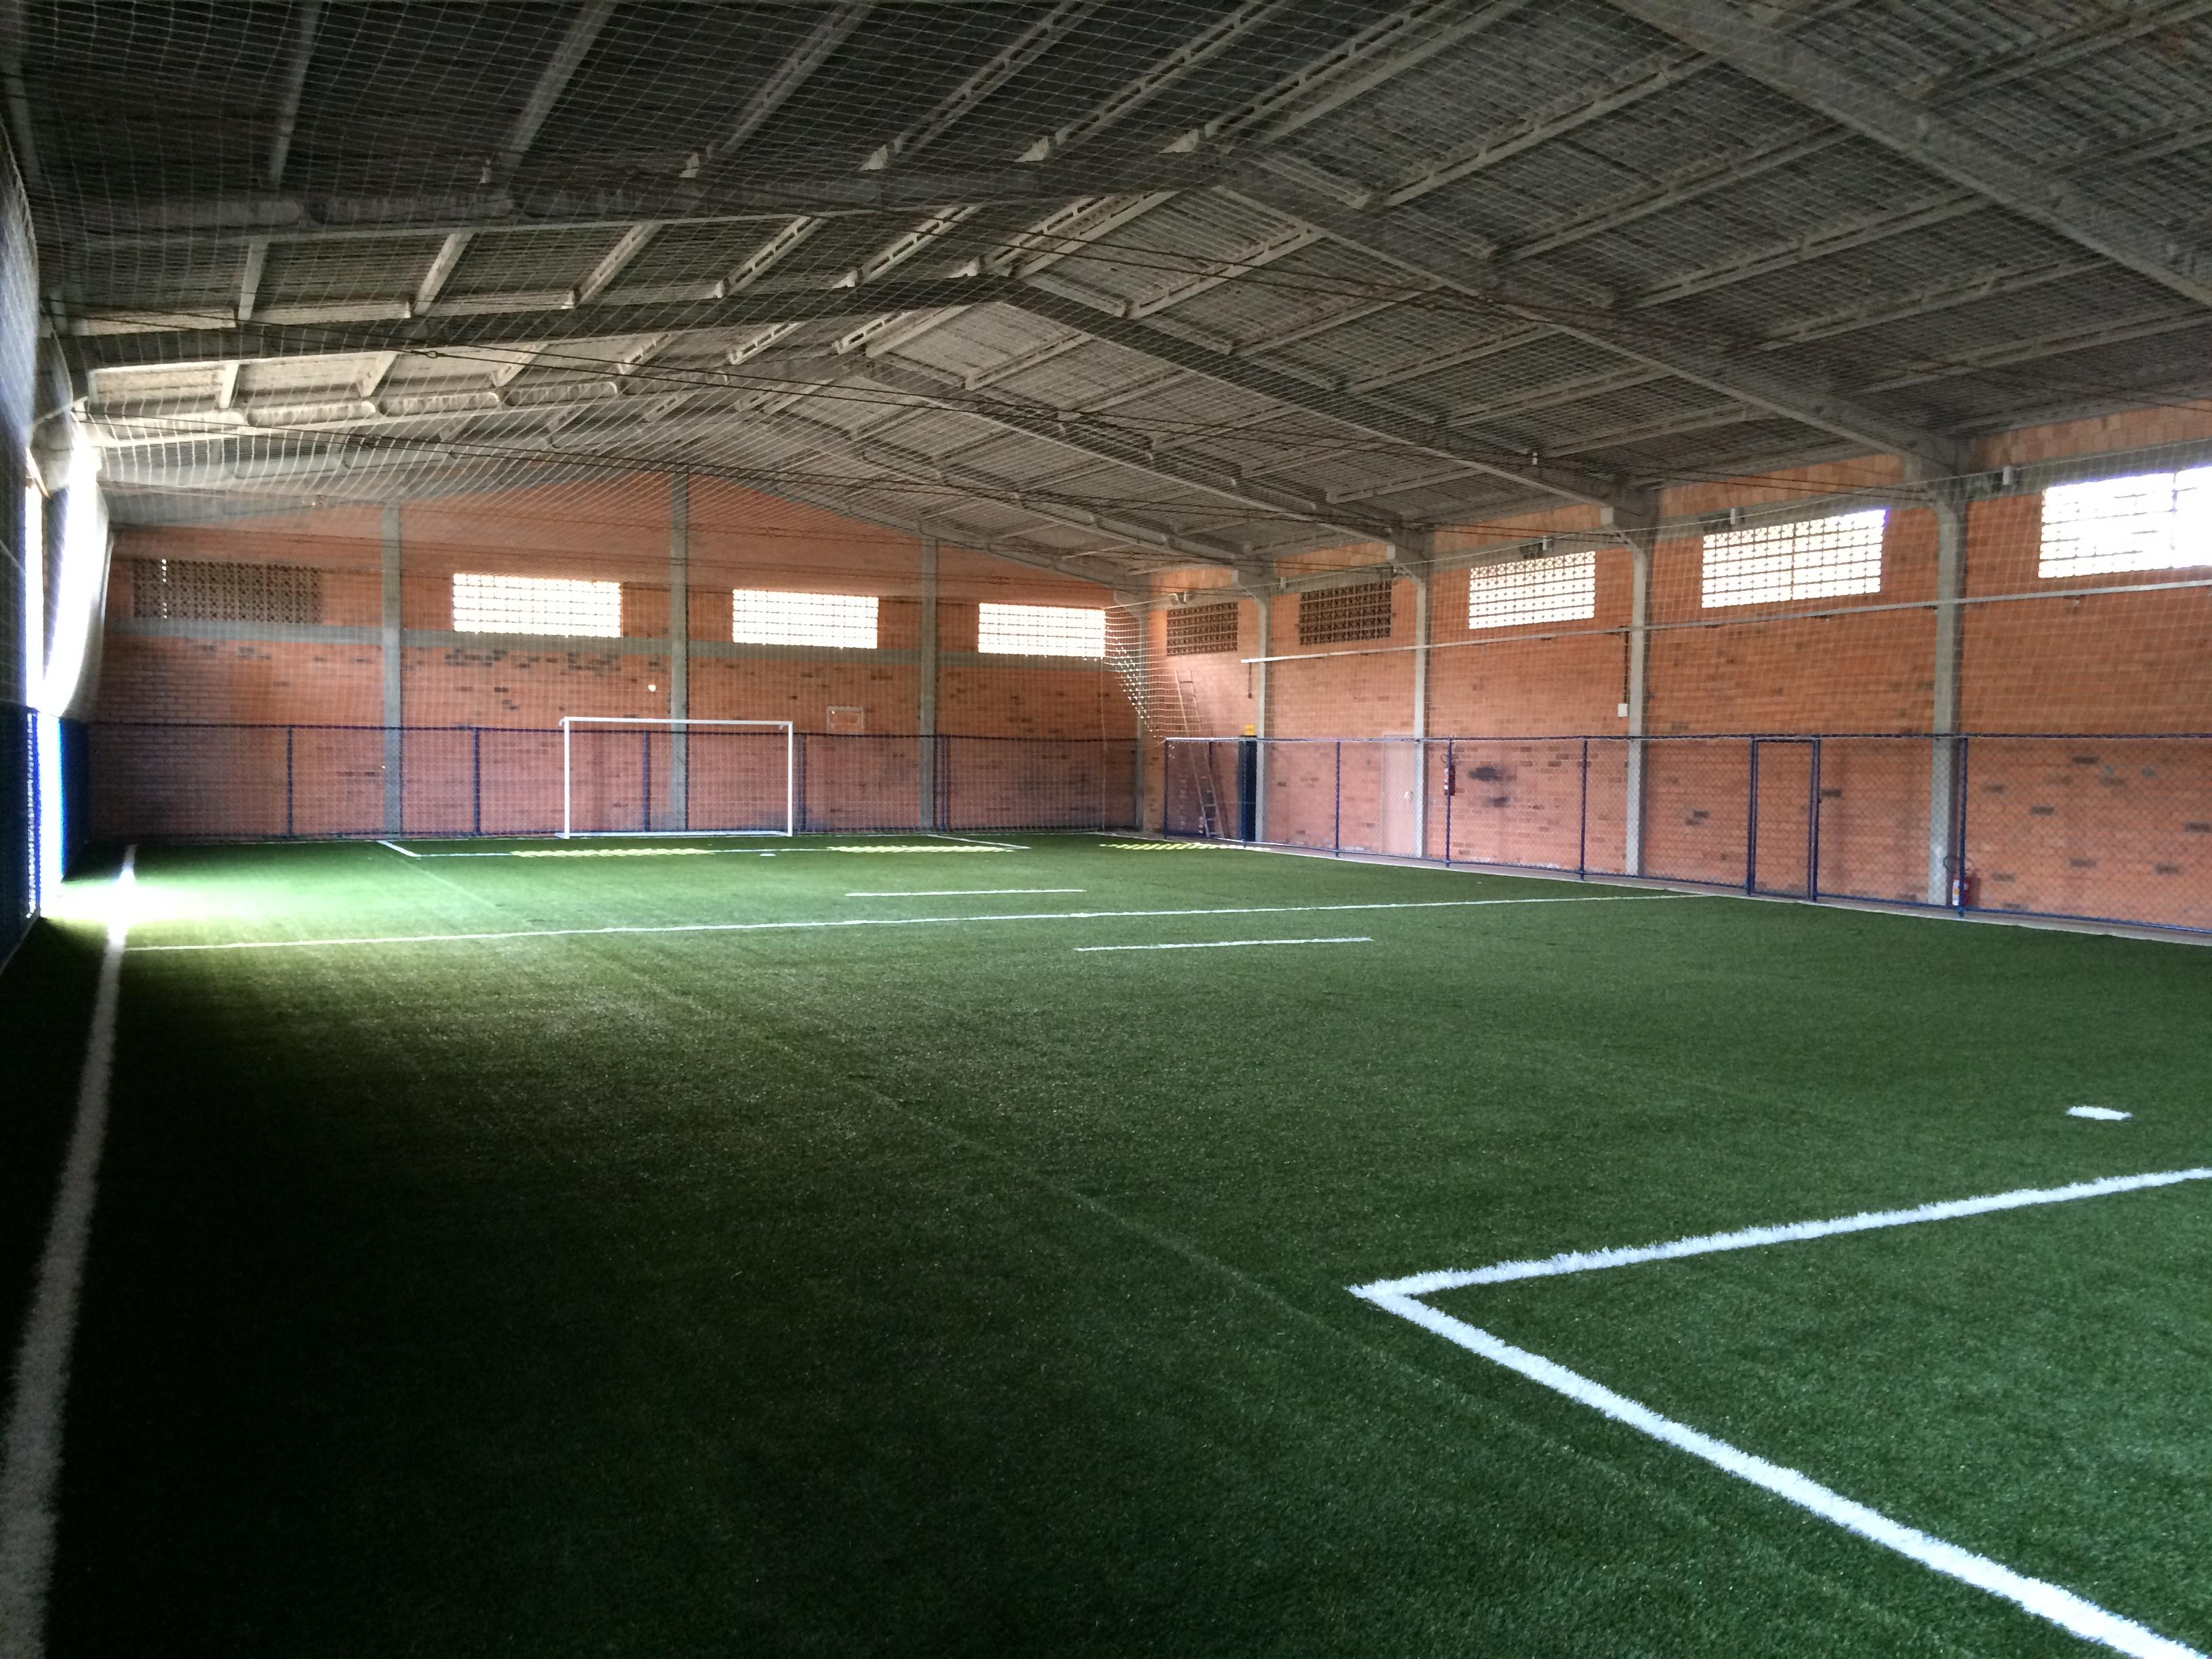 Complexo Esportivo Bola Bar - Instalação de grama sintética - Joinville / Santa Catarina